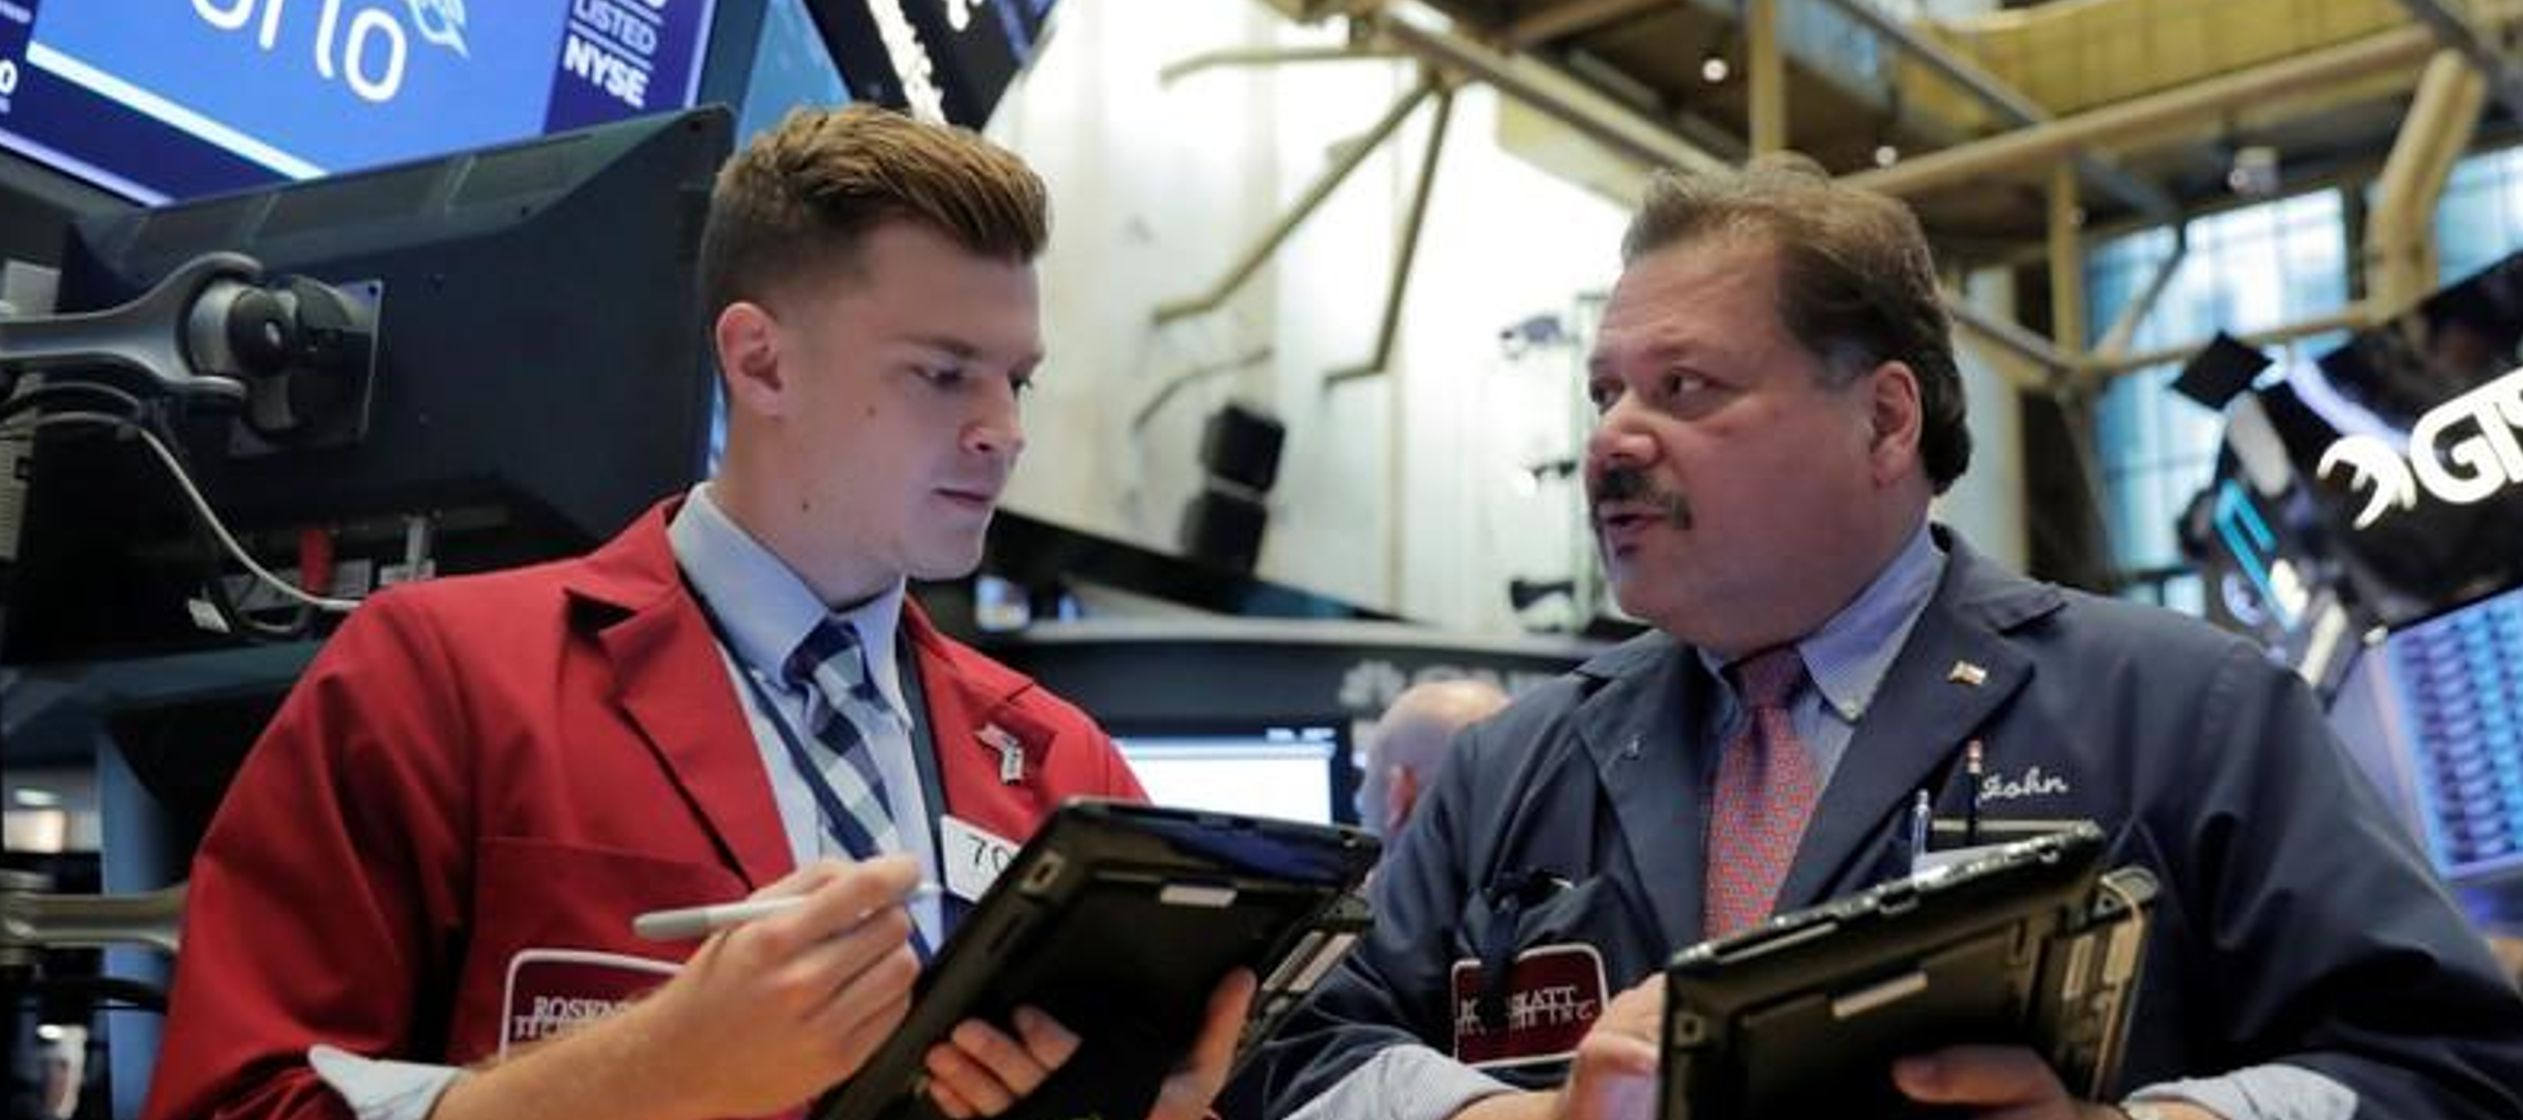 El repunte en Wall Street no para: S&P 500 vuelve a tocar récord tras meses de dudas